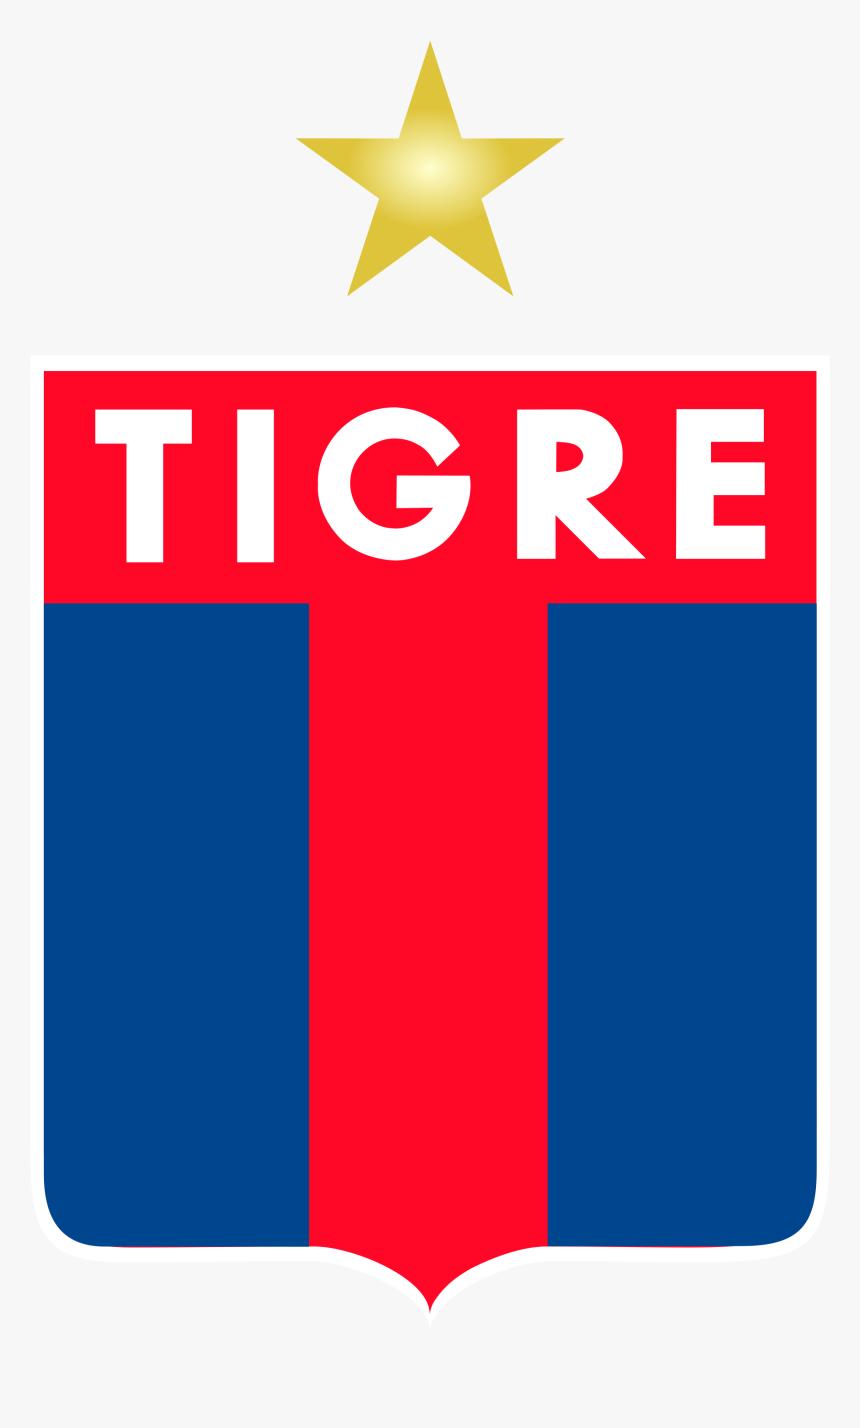 Escudo Club Atletico Tigre Hd Png Download Kindpng